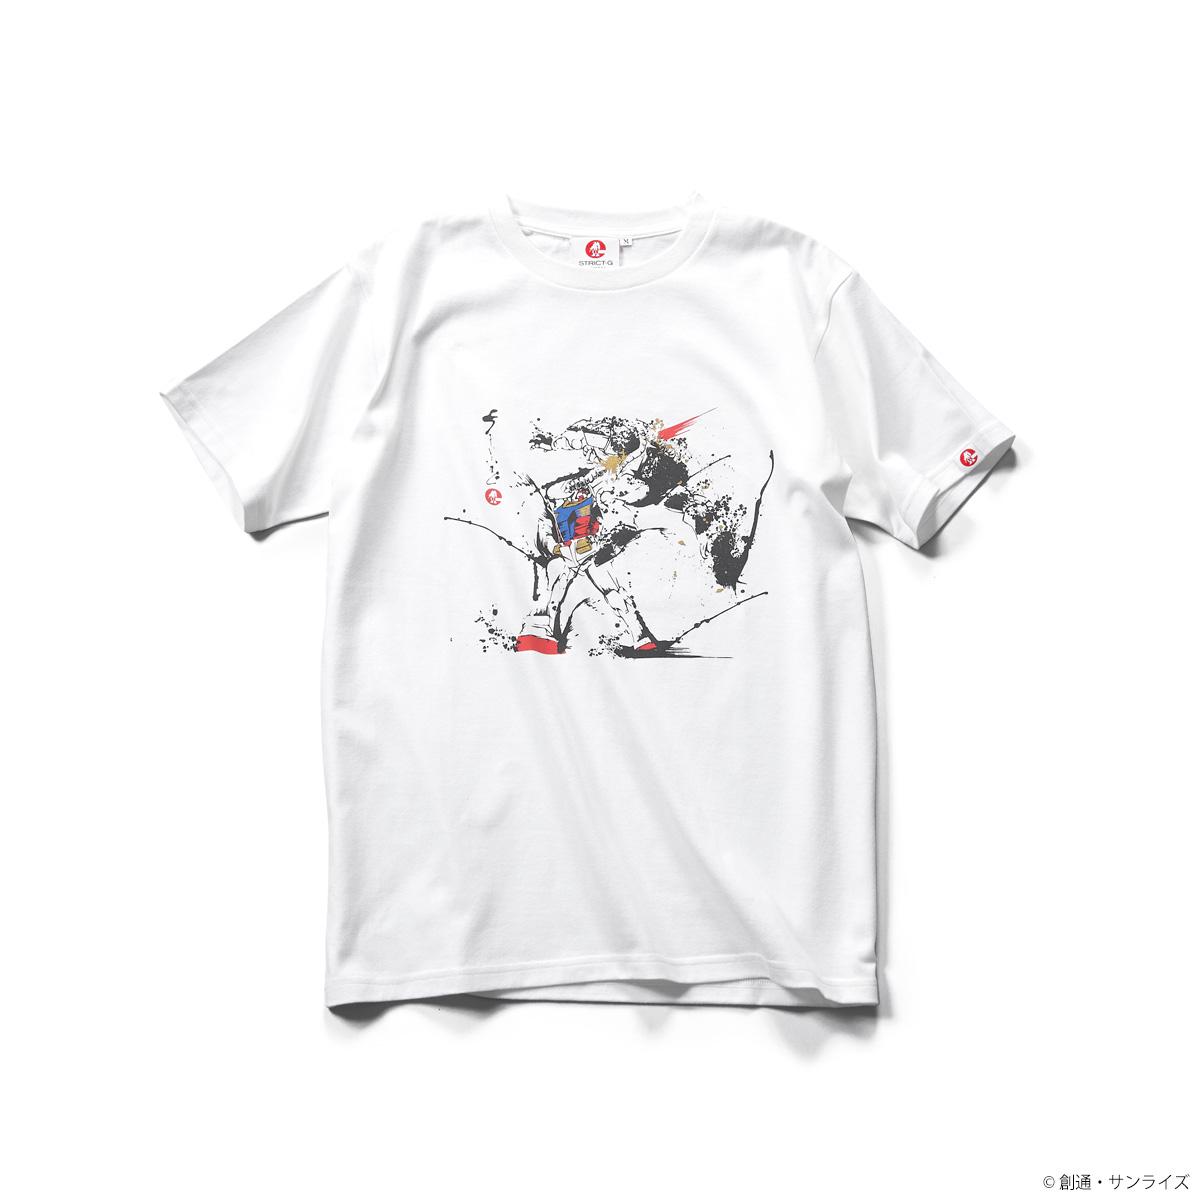 STRICT-G JAPAN『機動戦士ガンダム』筆絵Tシャツ ザク一刺し柄